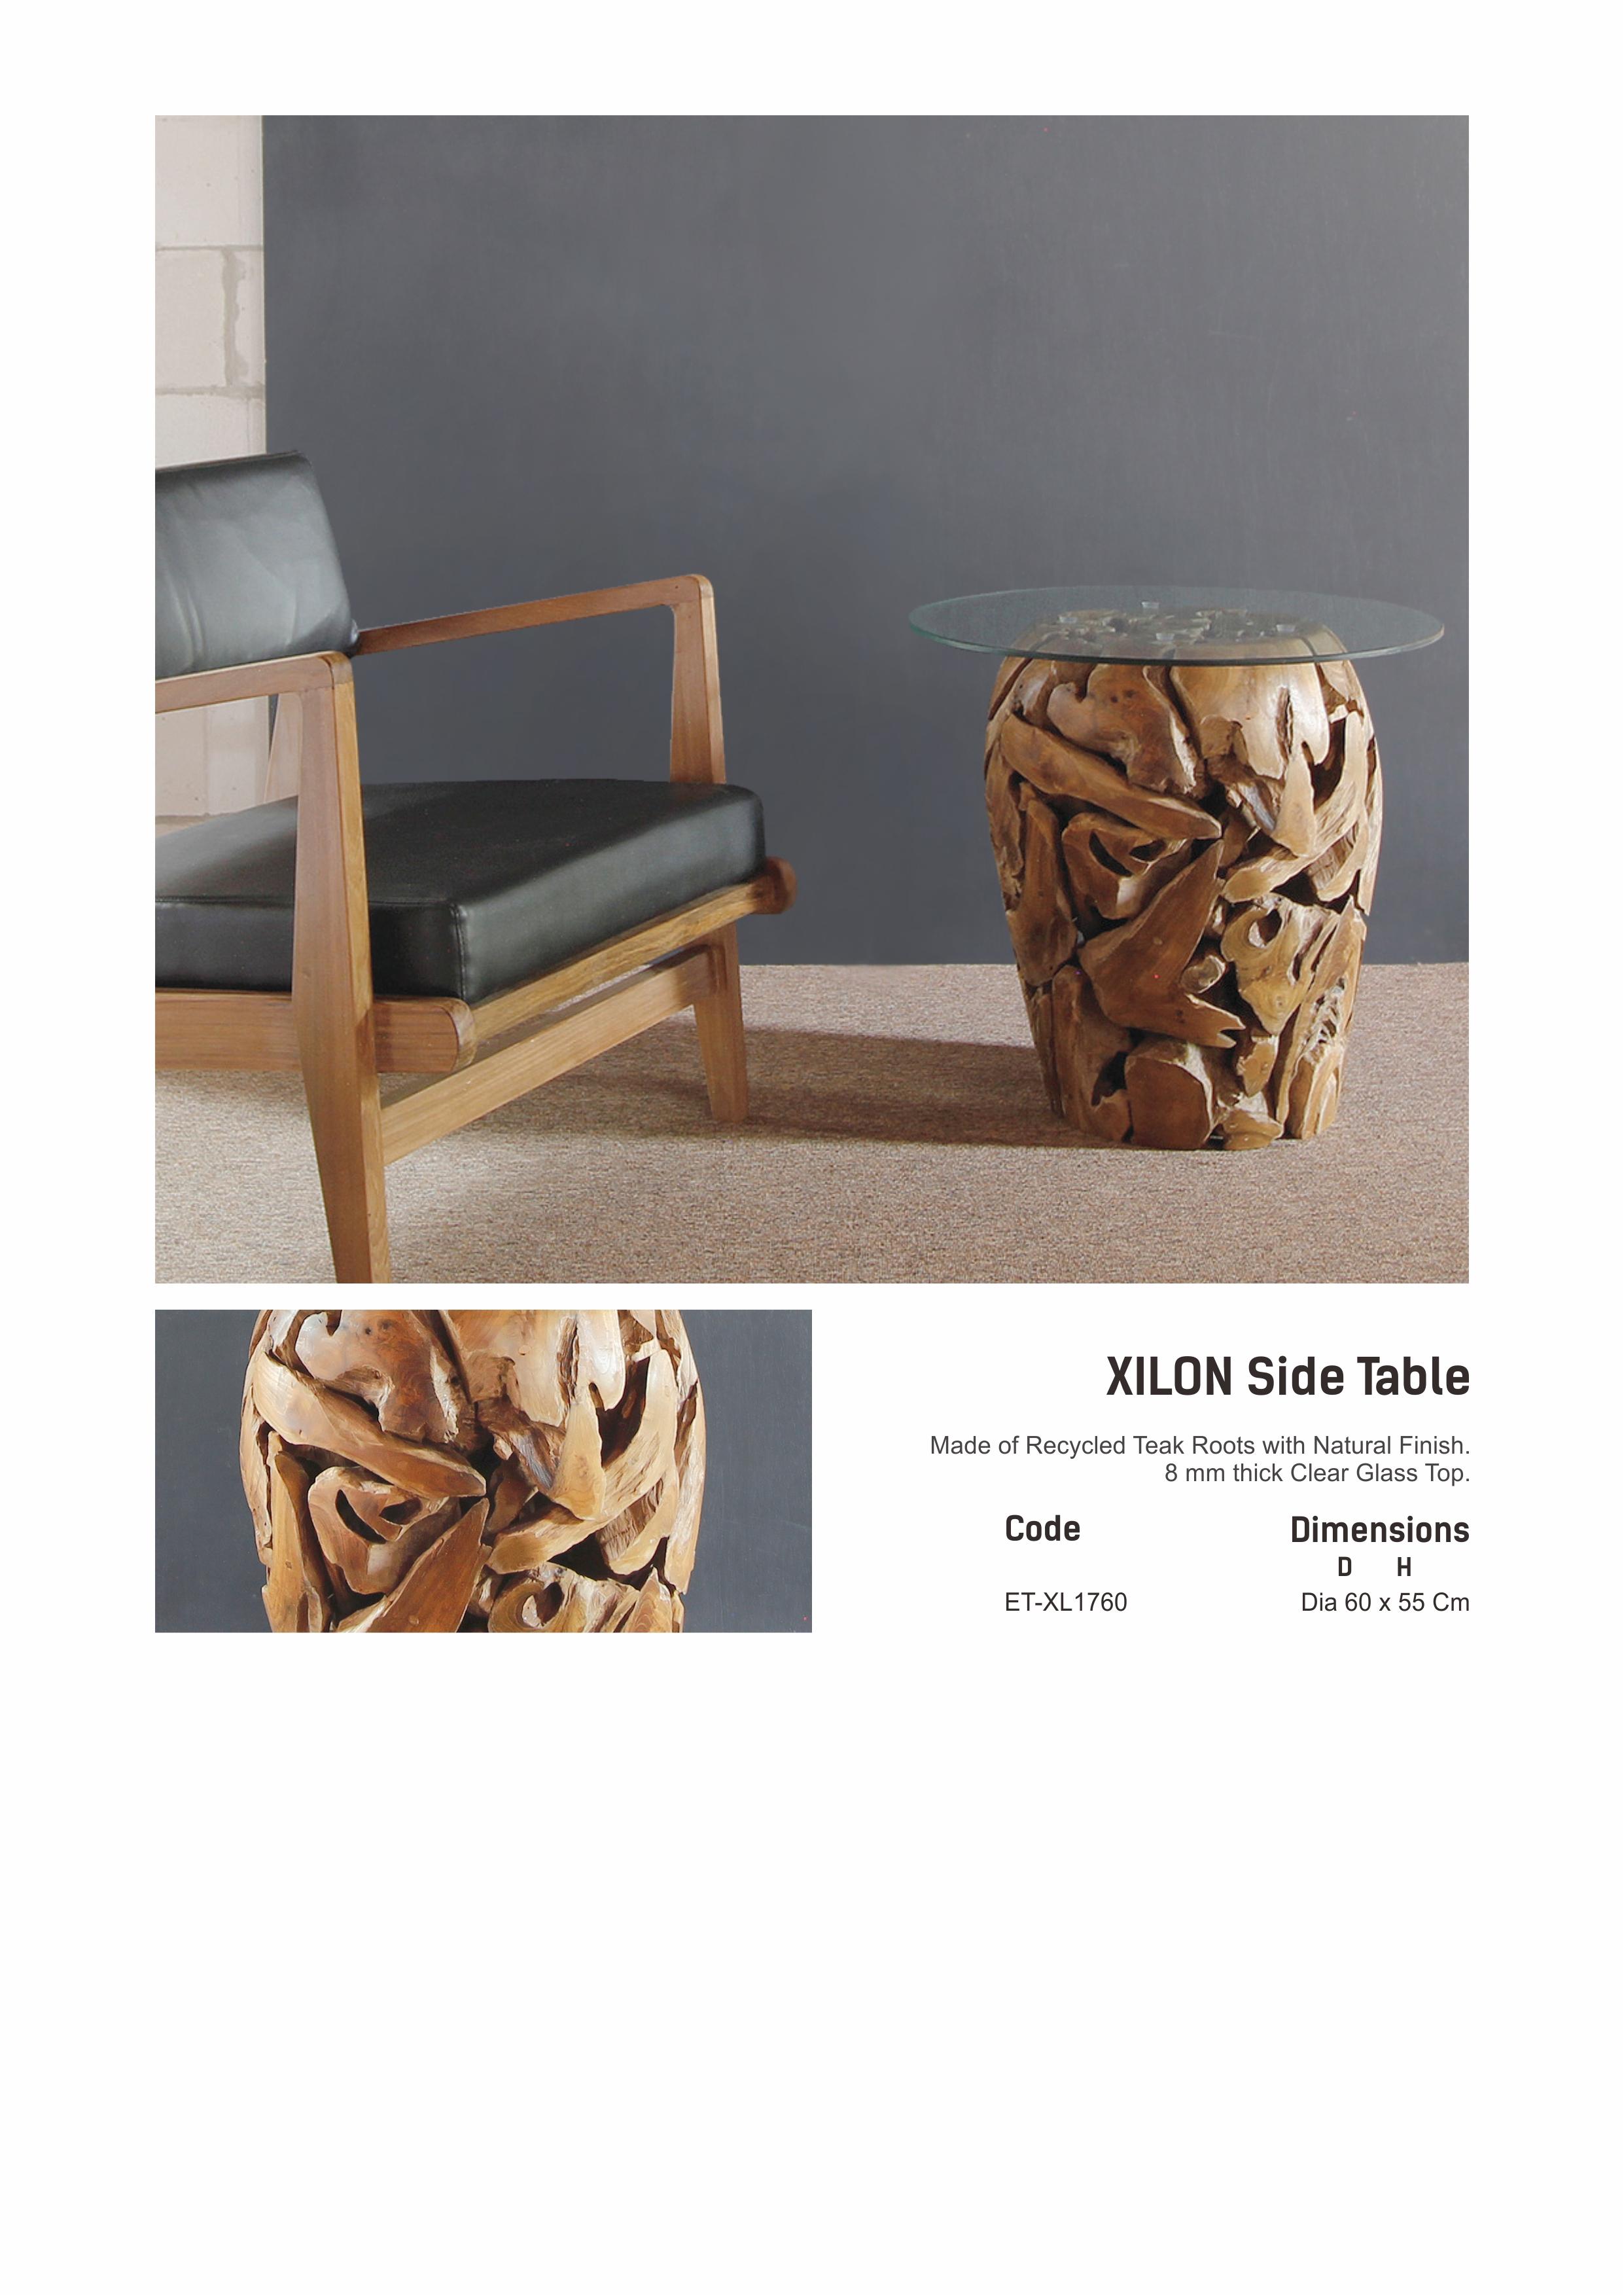 17. XILON Side Table